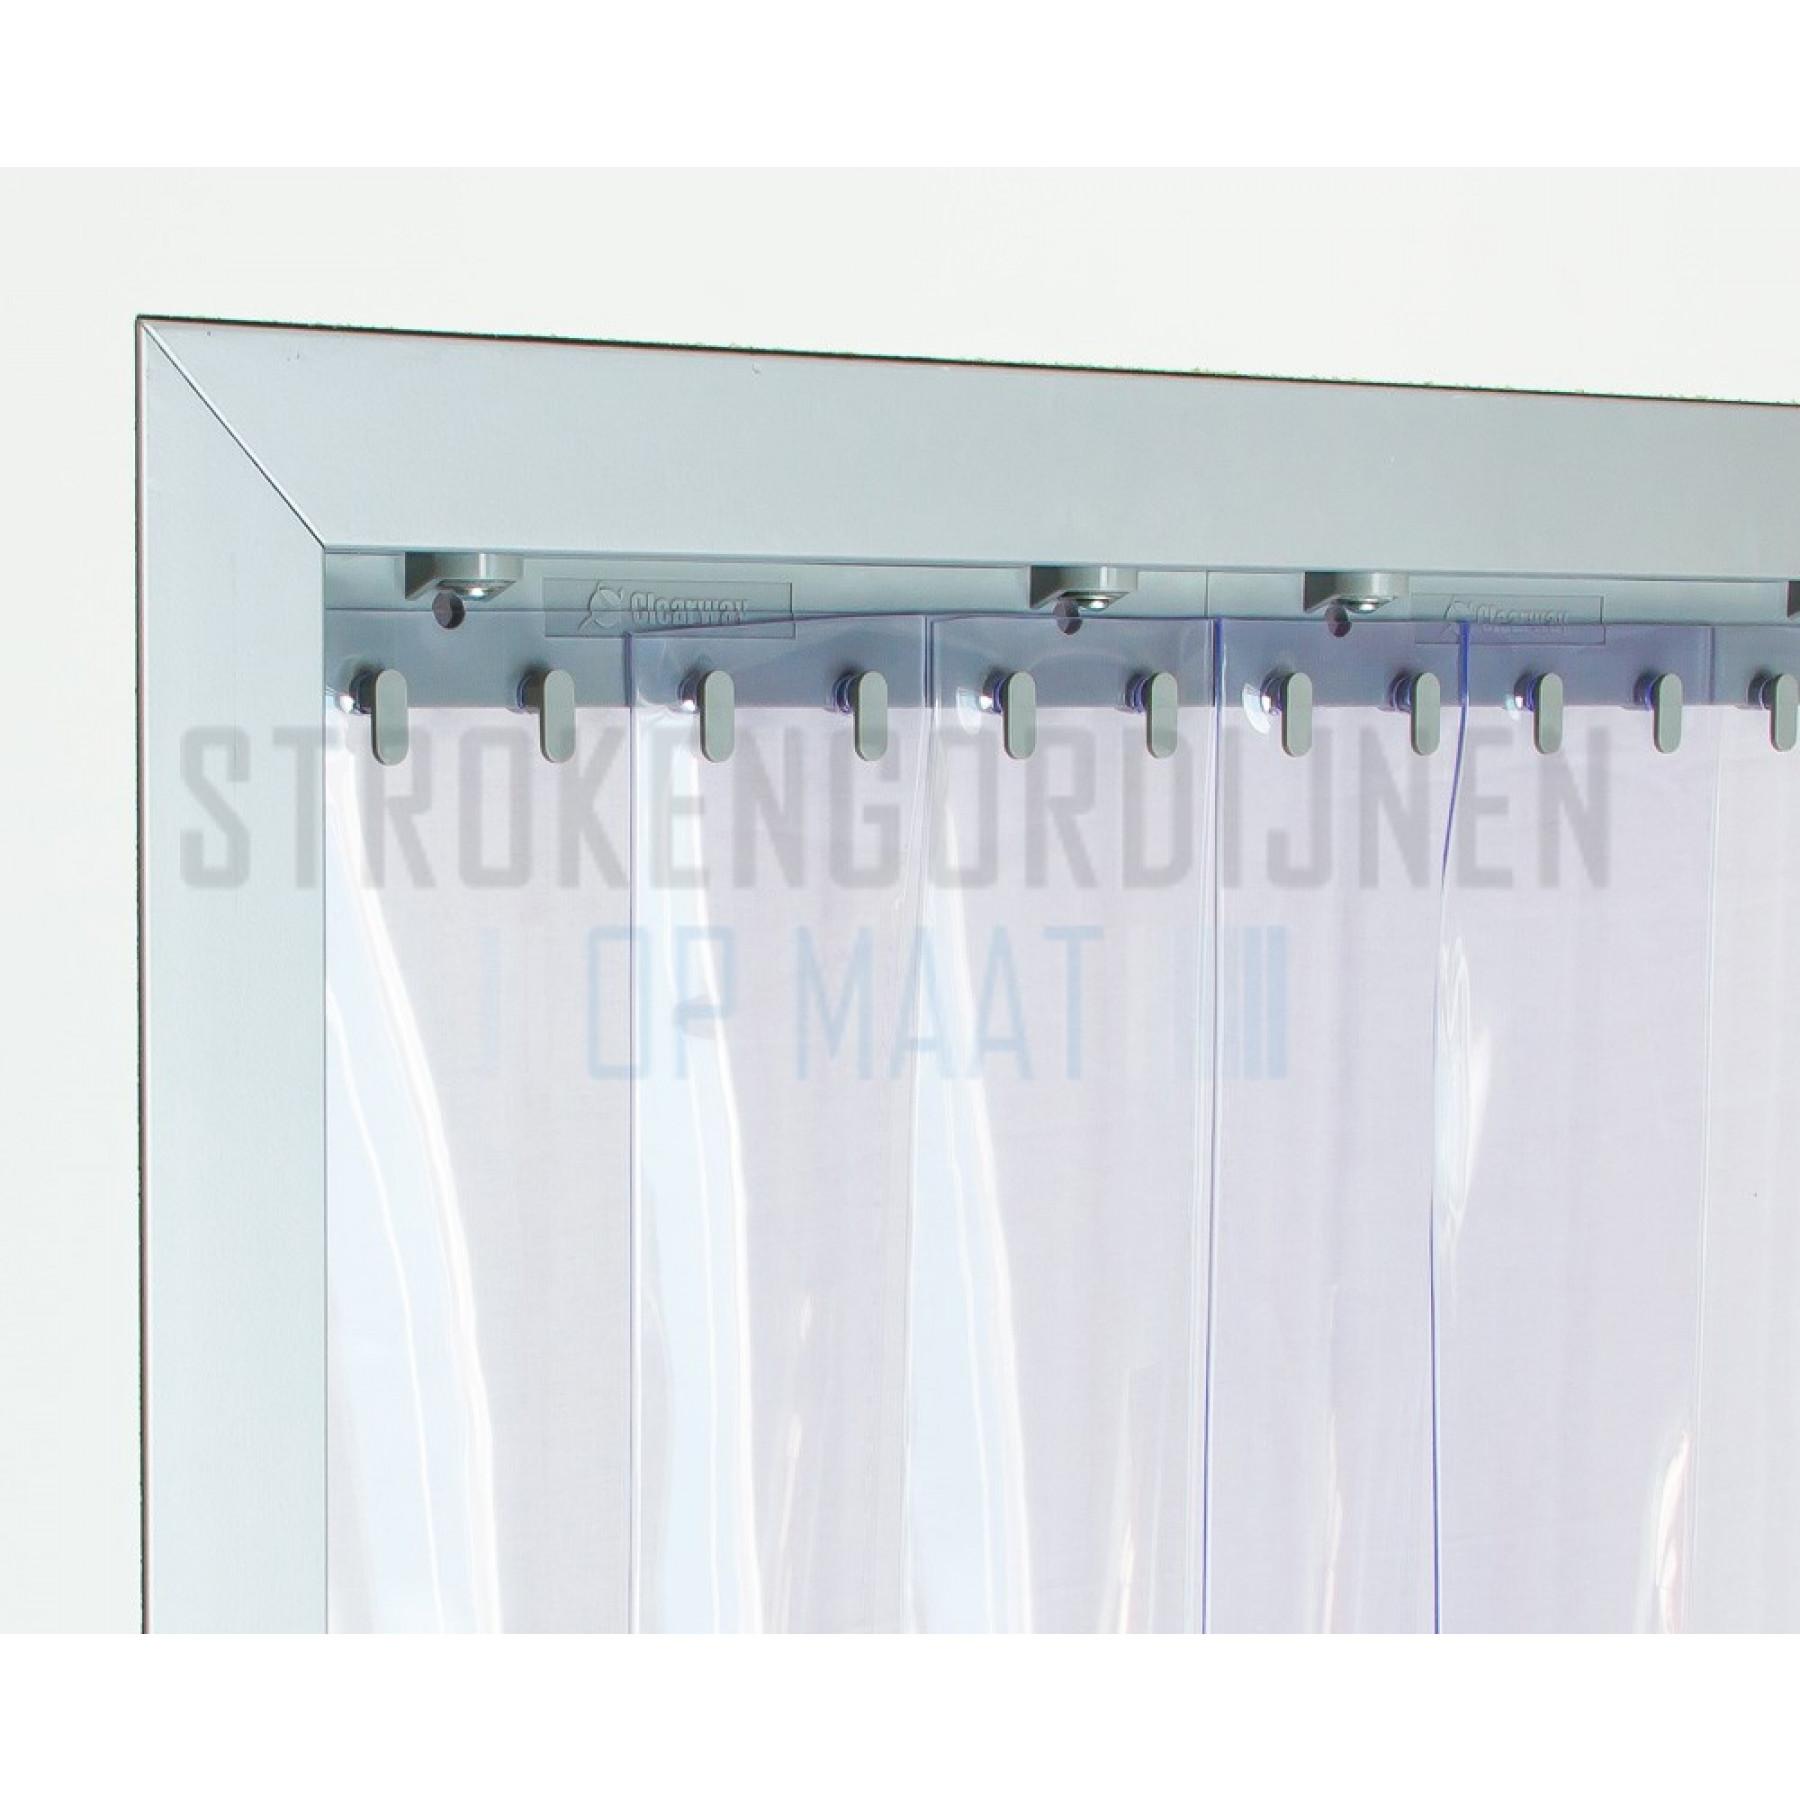 PVC Rolle, 200mm breit, 2mm dick, 50 Meter lang, Tiefkühlraum Qualität, transparent